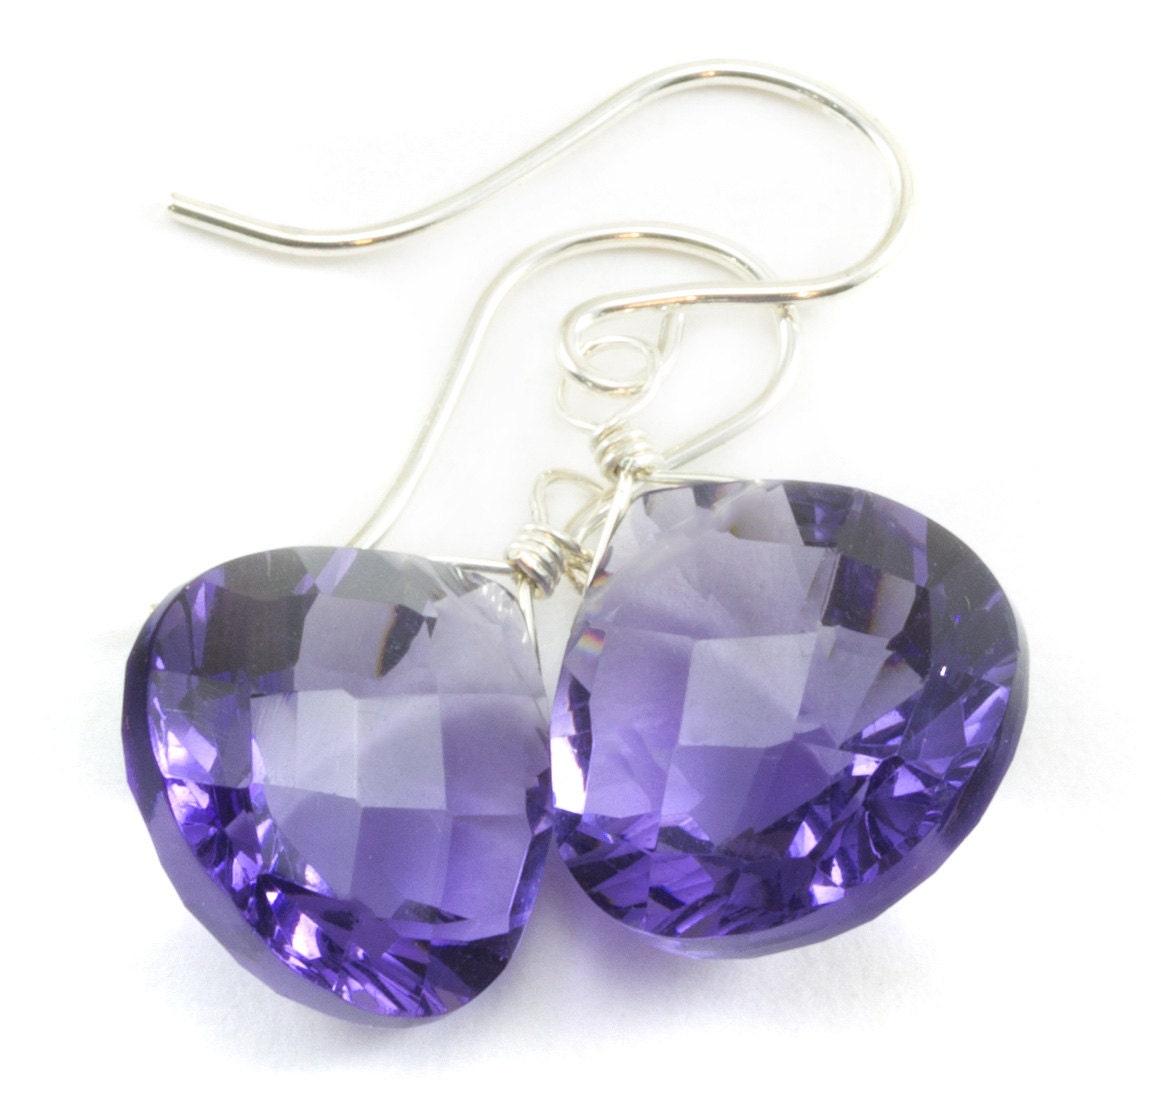 Lavender Tanzanite: Lavender Simulated Tanzanite Earrings Faceted Drop Soft Purple